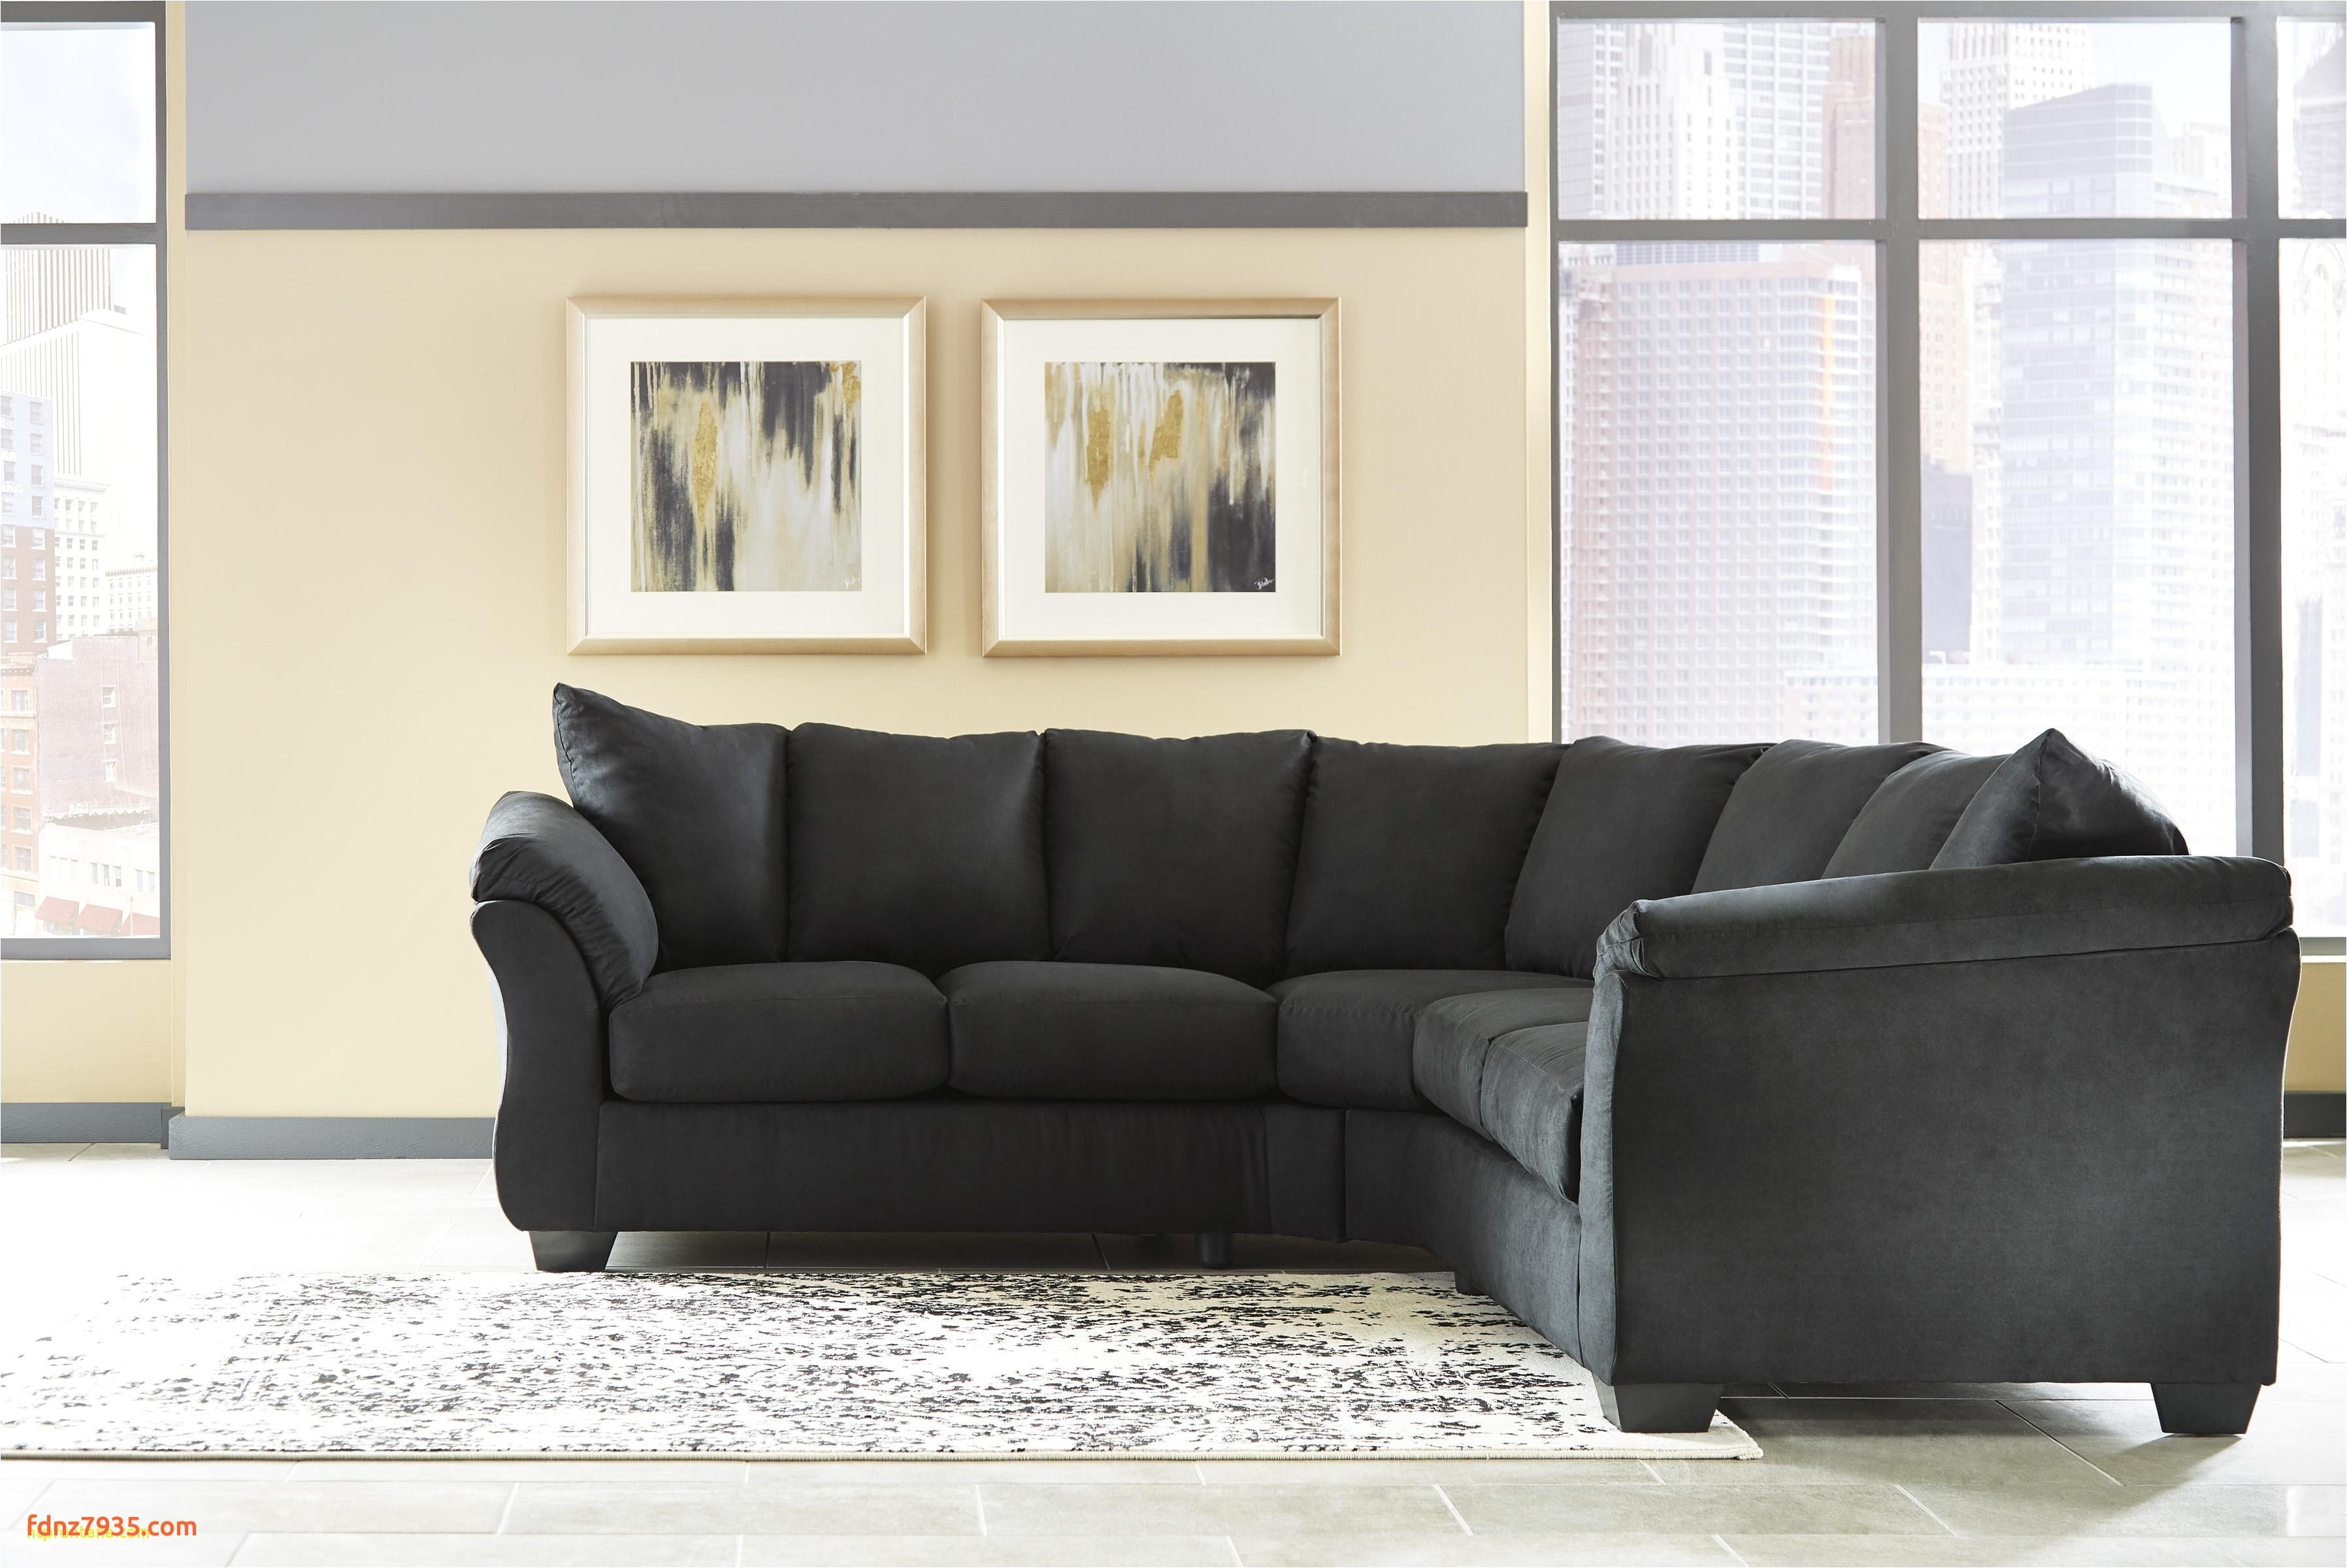 Cheap Sectional Sofas Under 500 Memory Foam Sectional Sofa Fresh Sofa Design